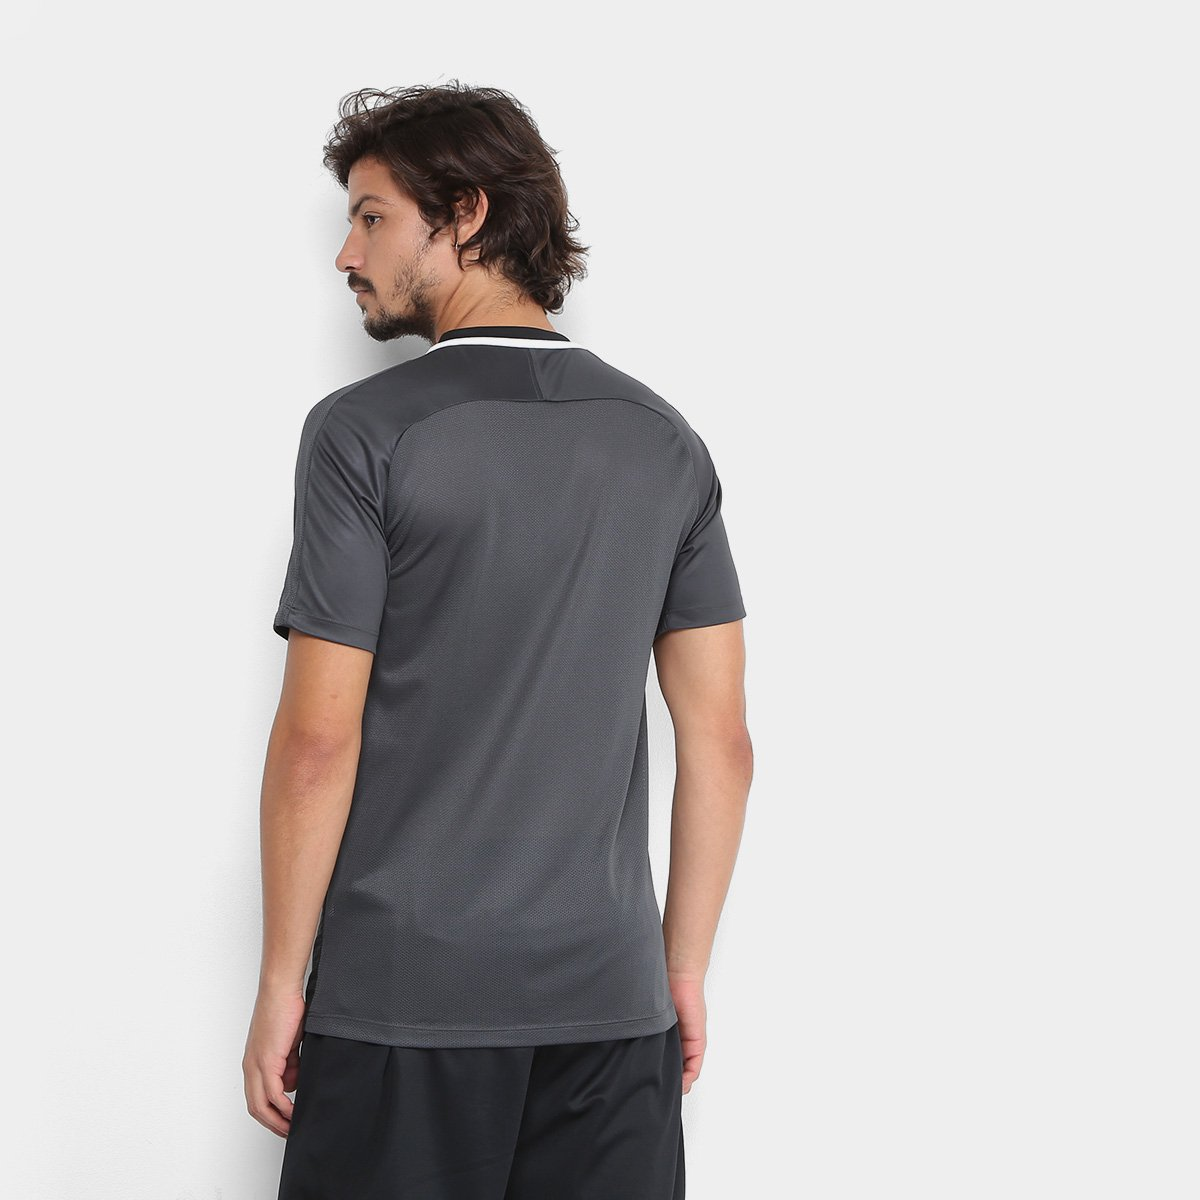 Camisa Nike Dry Academy Top SS GX Masculina - Preto e Branco ... 7ed65dc7d48ef